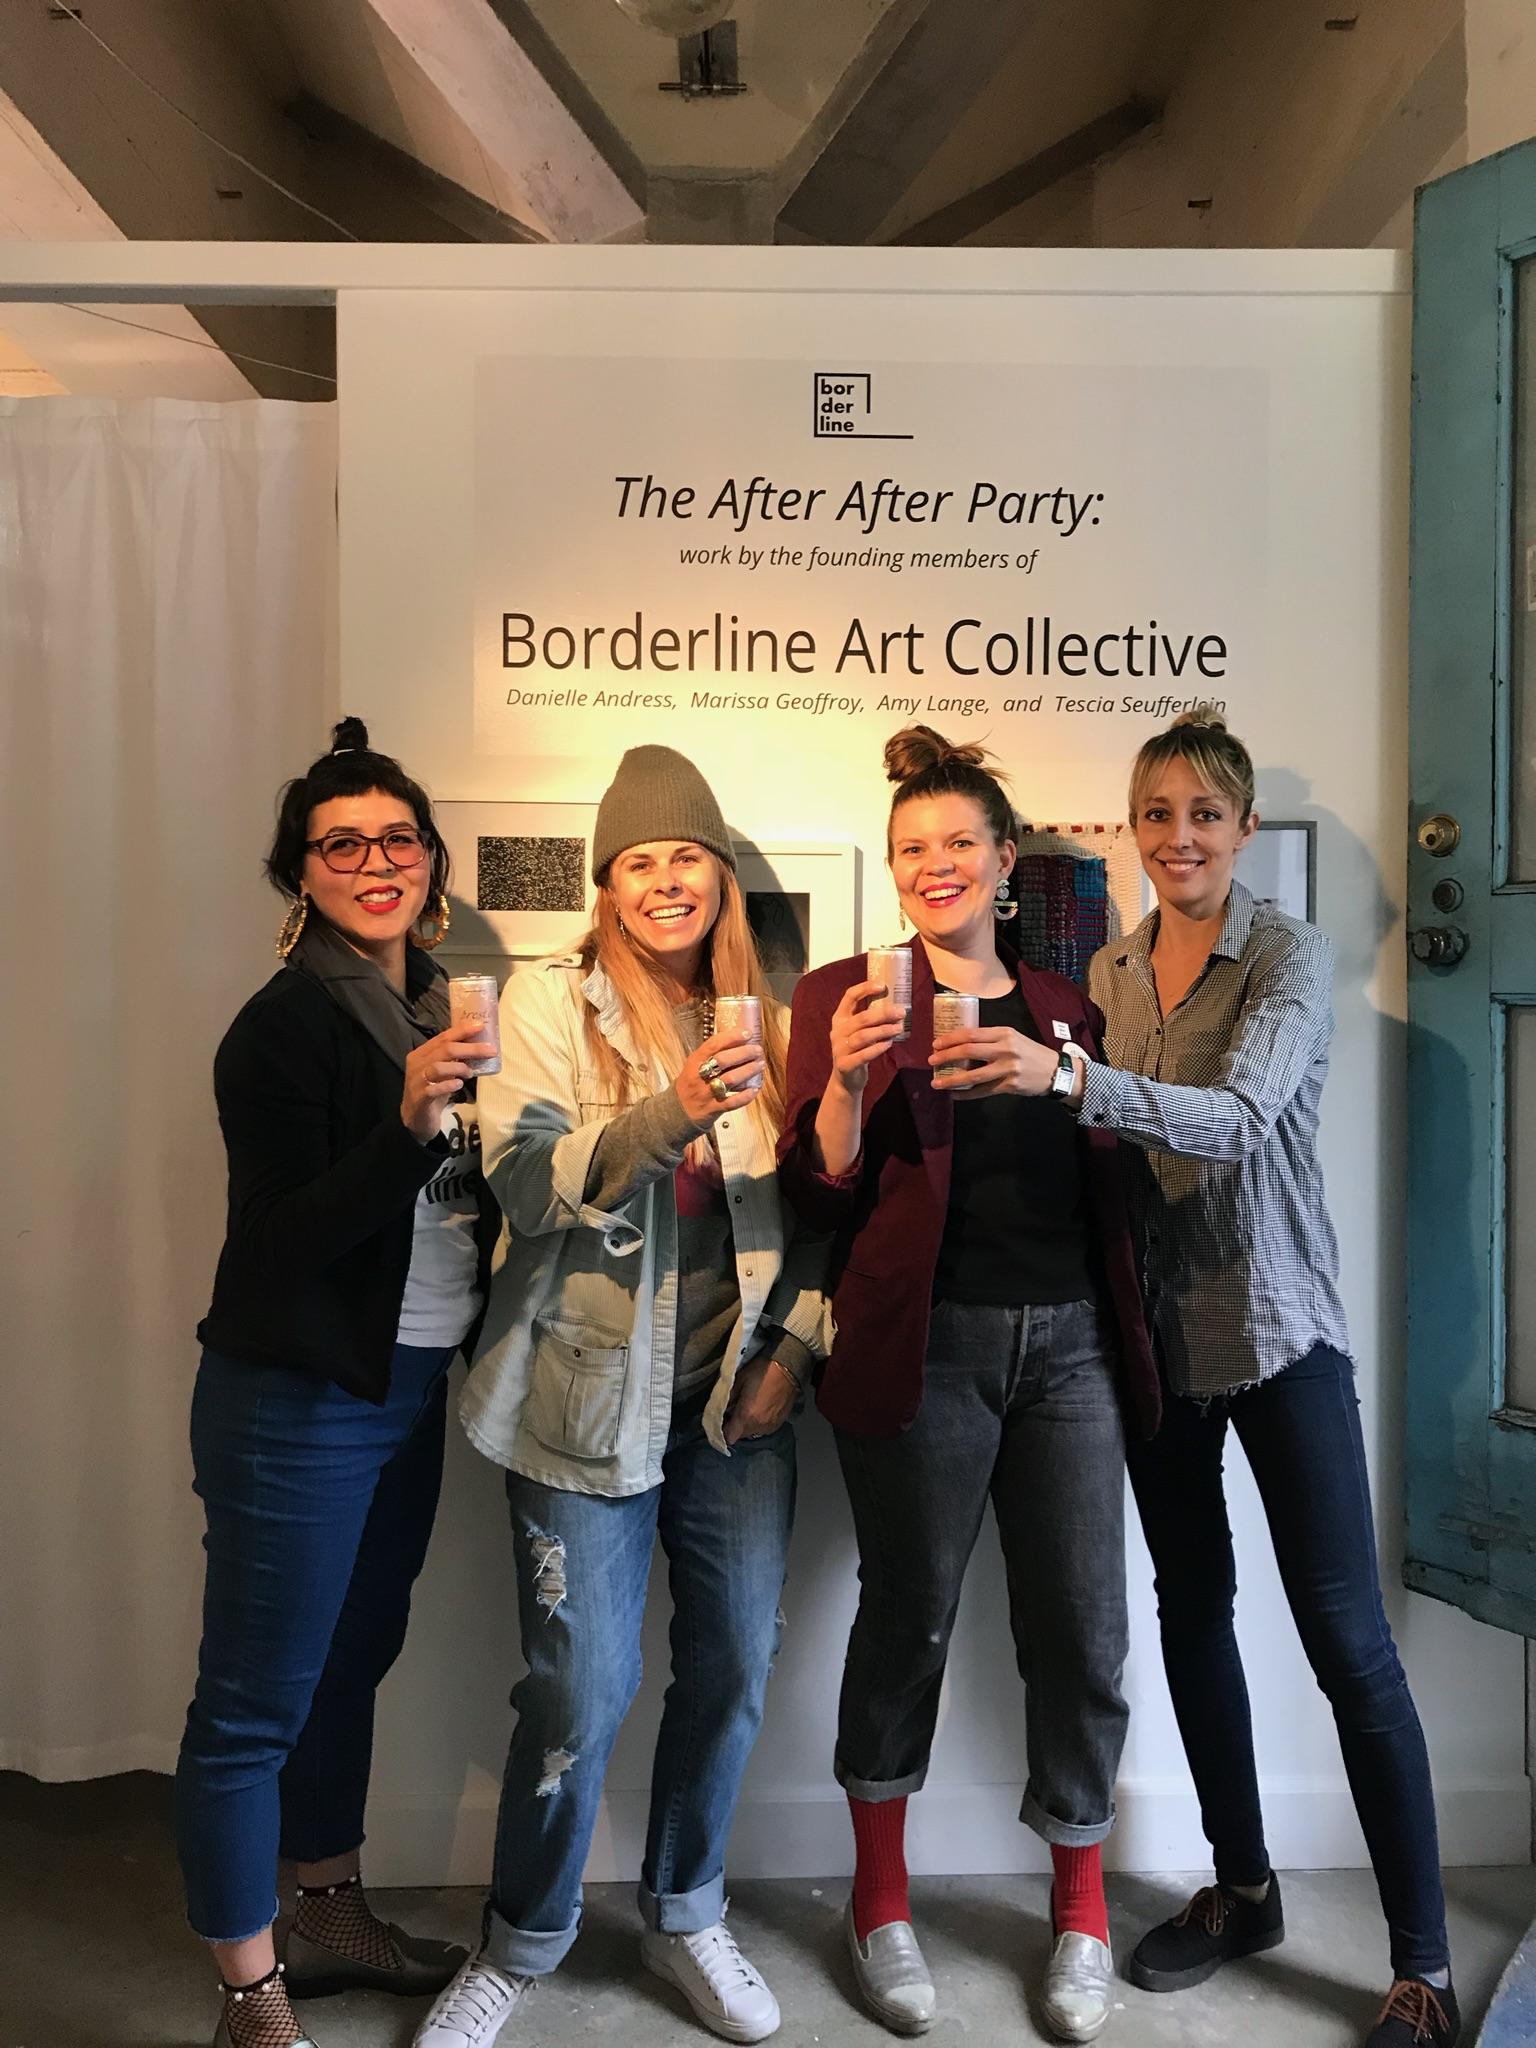 All 4 Members of Borderline